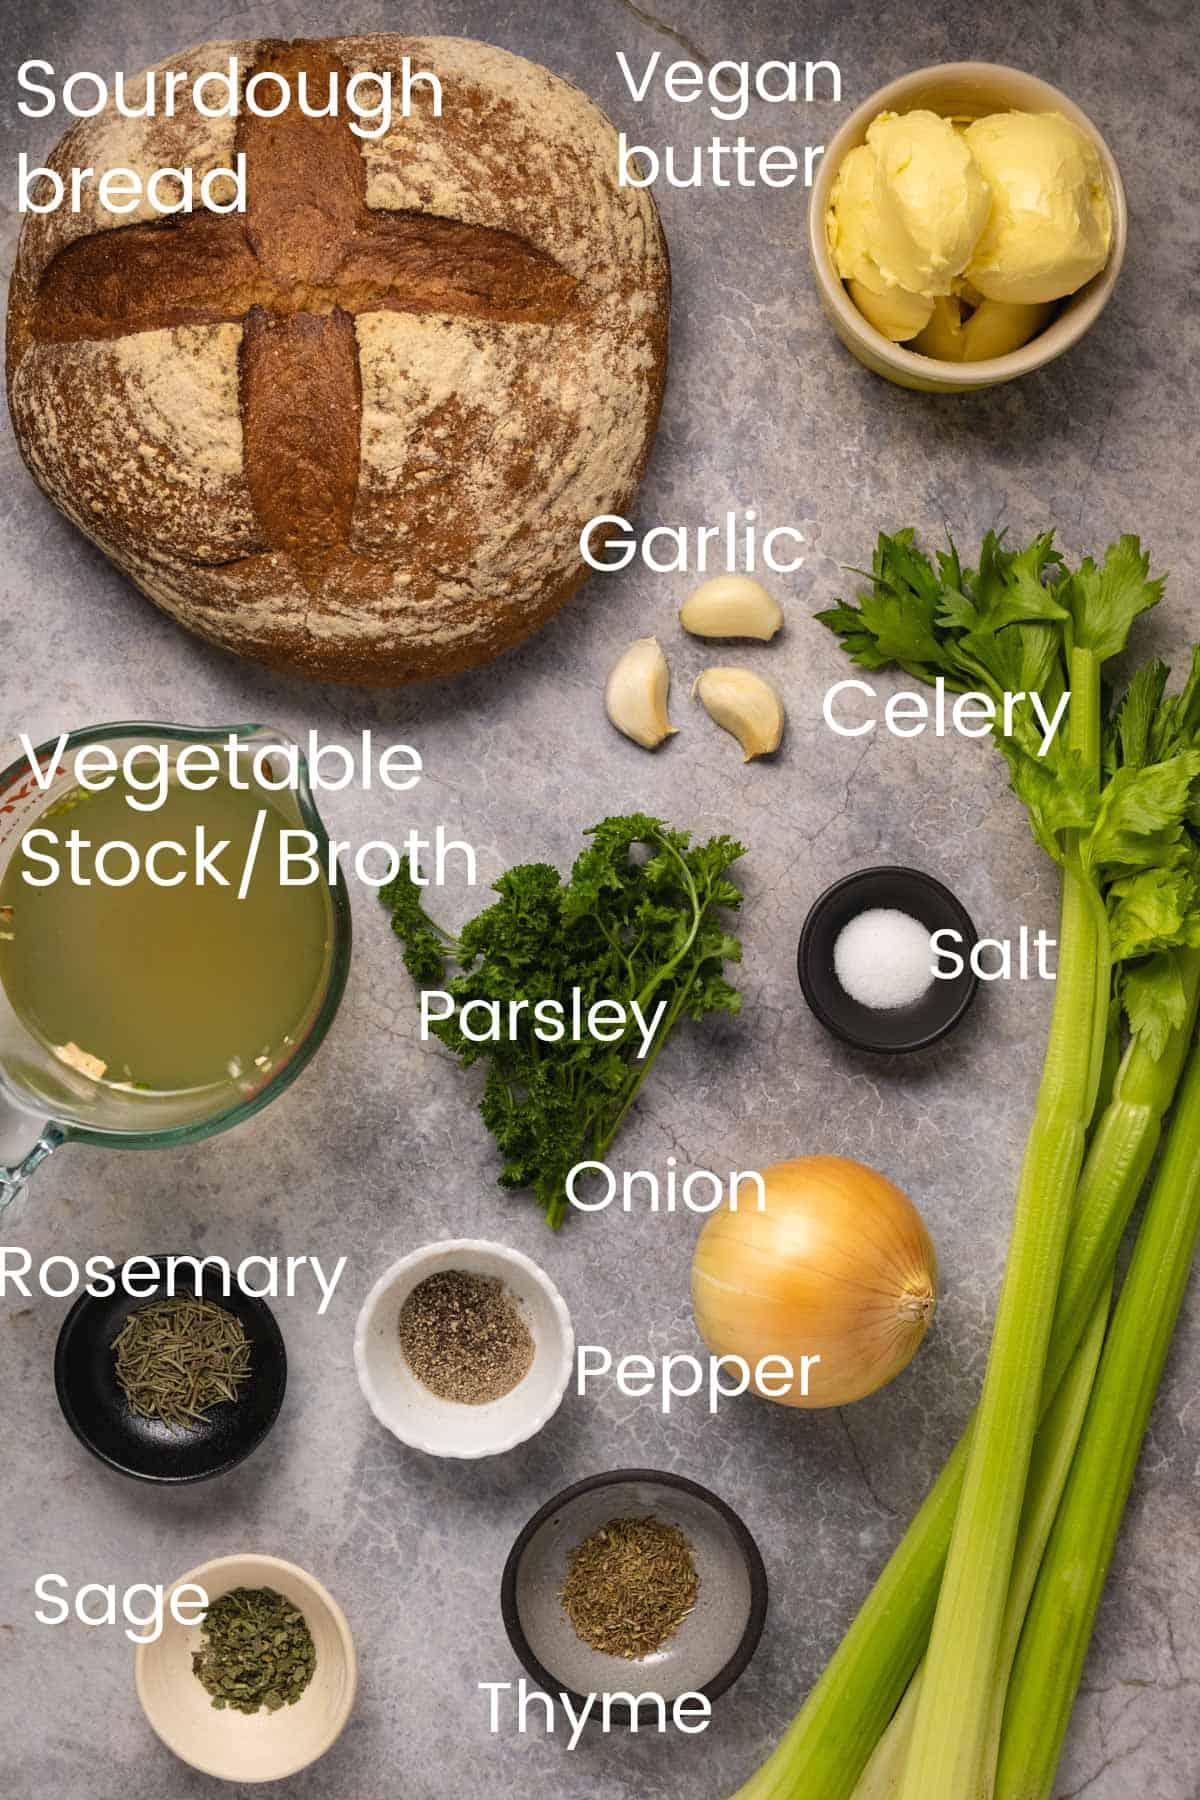 Photo of ingredients for vegan stuffing